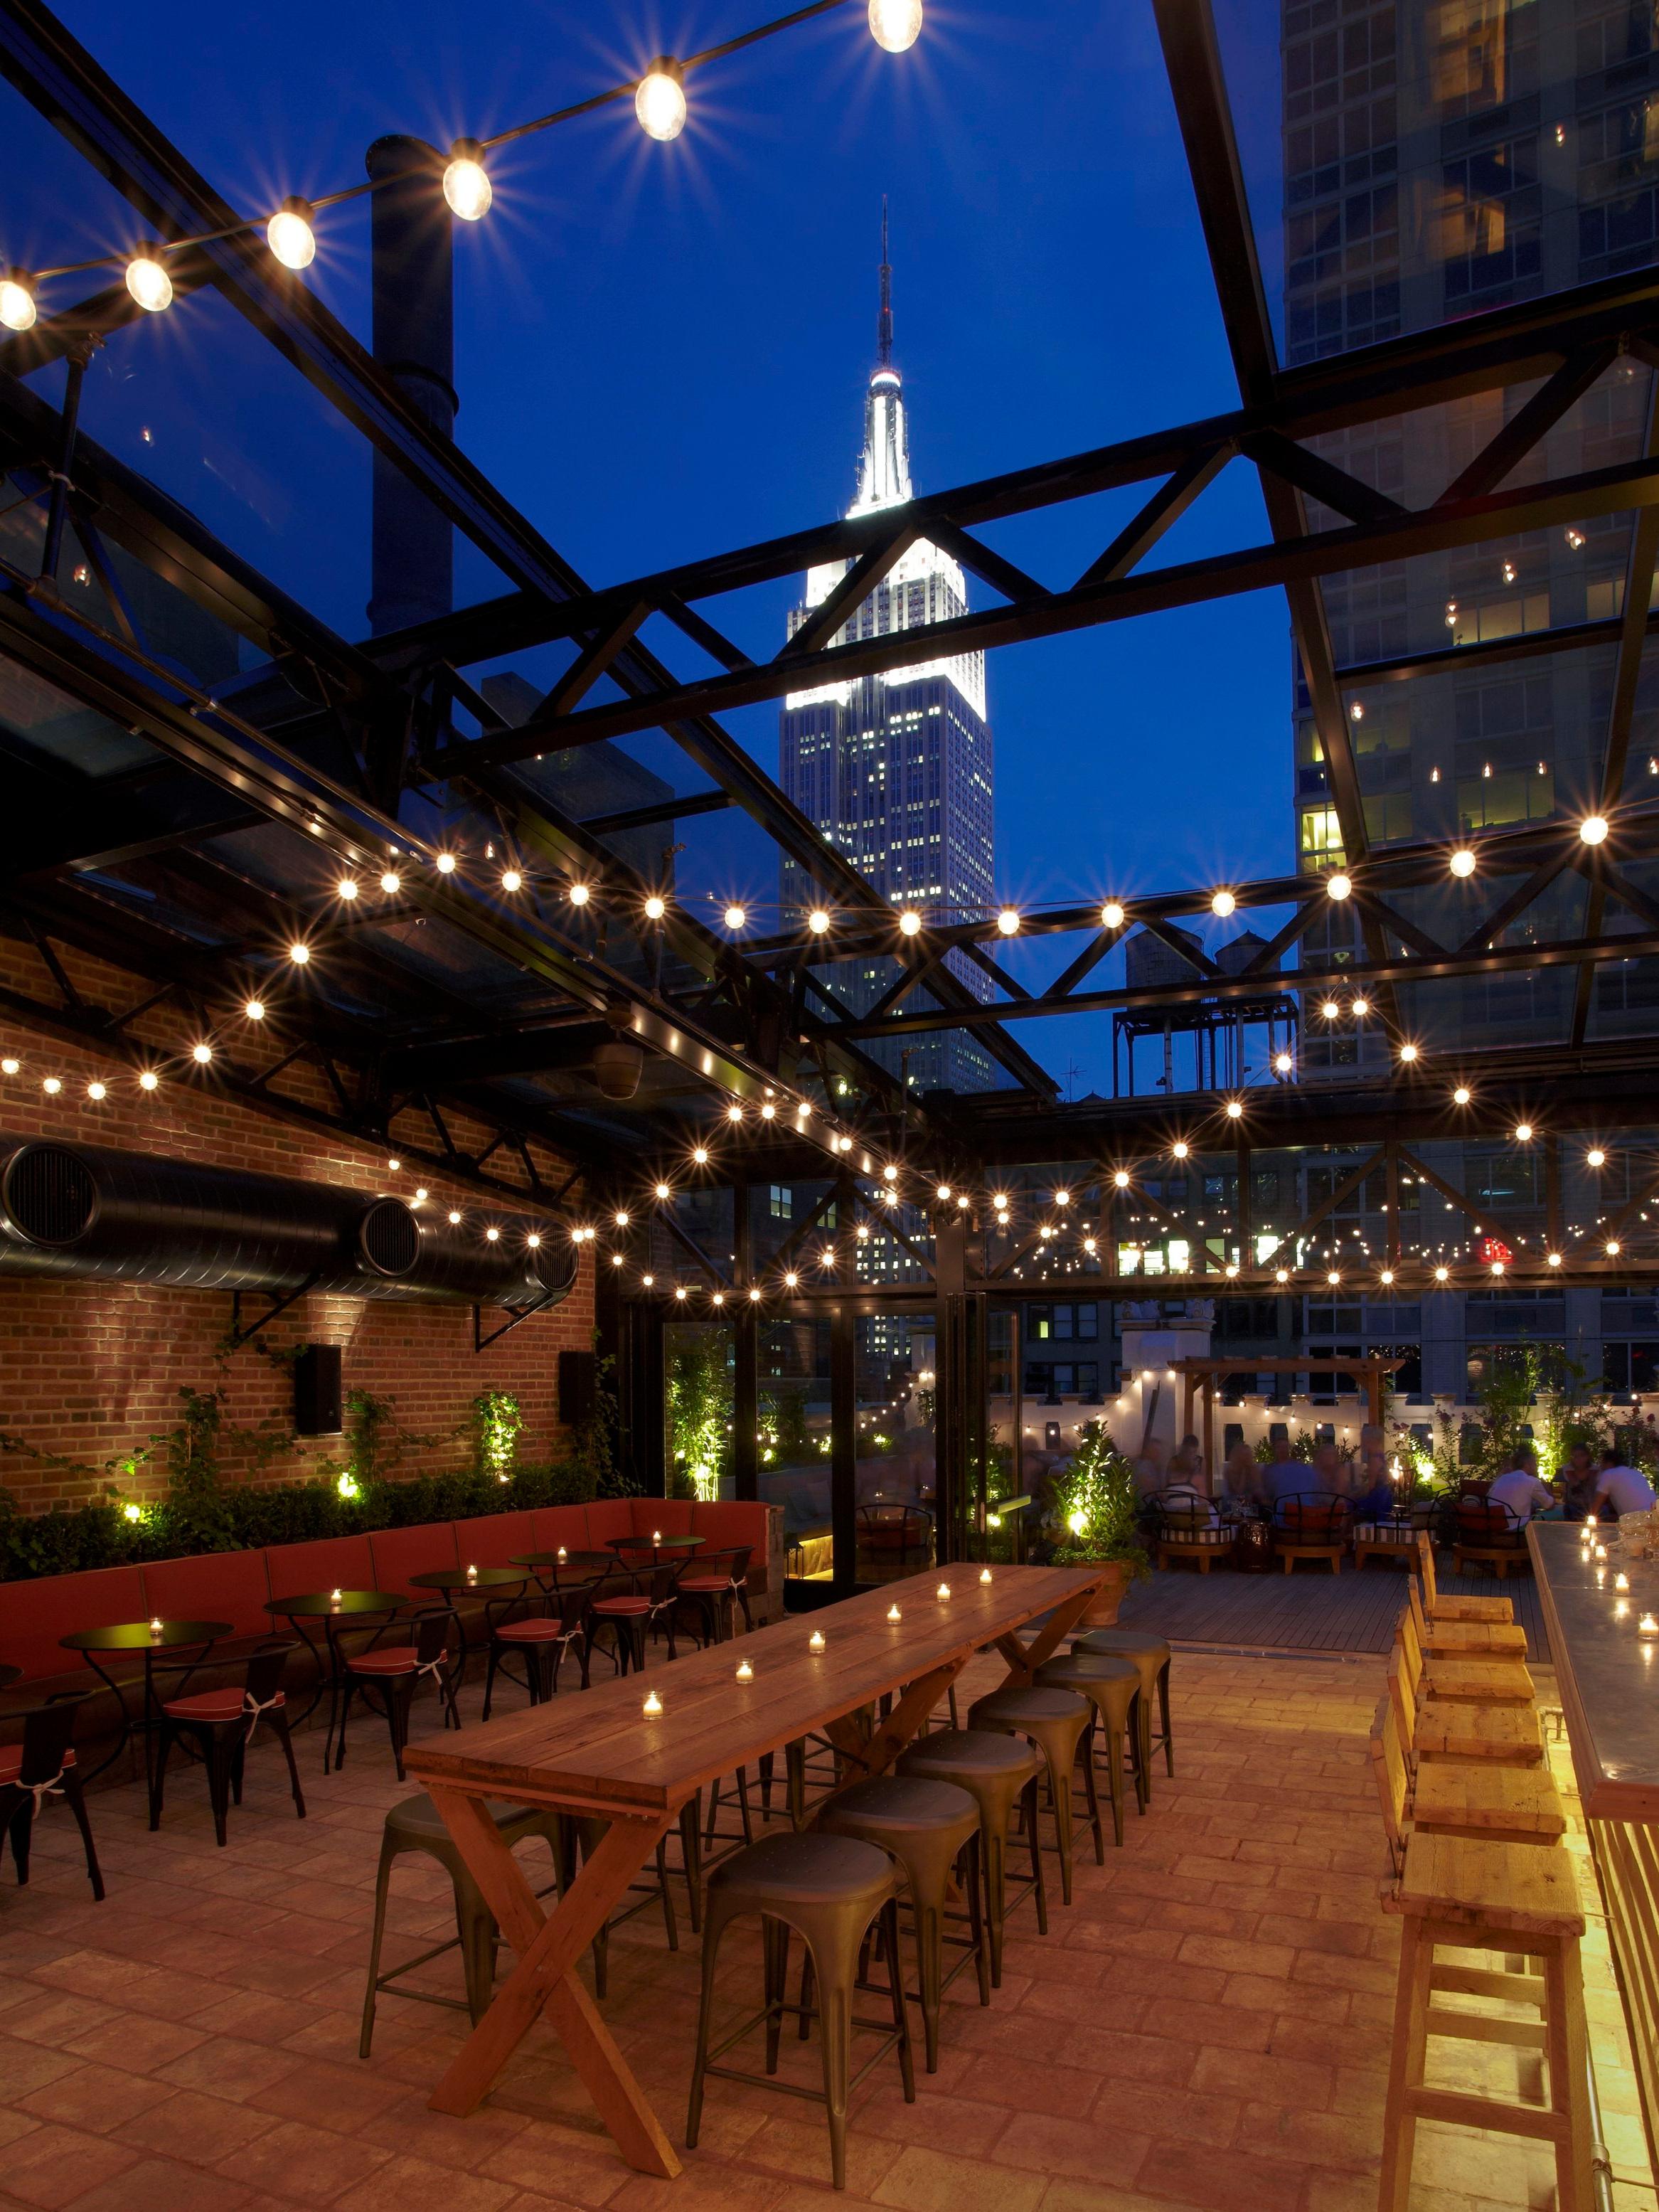 RefineryRooftop-refinery-rooftop-bar-midtown-new-york-manhattan-best-bars-pineapple-princess